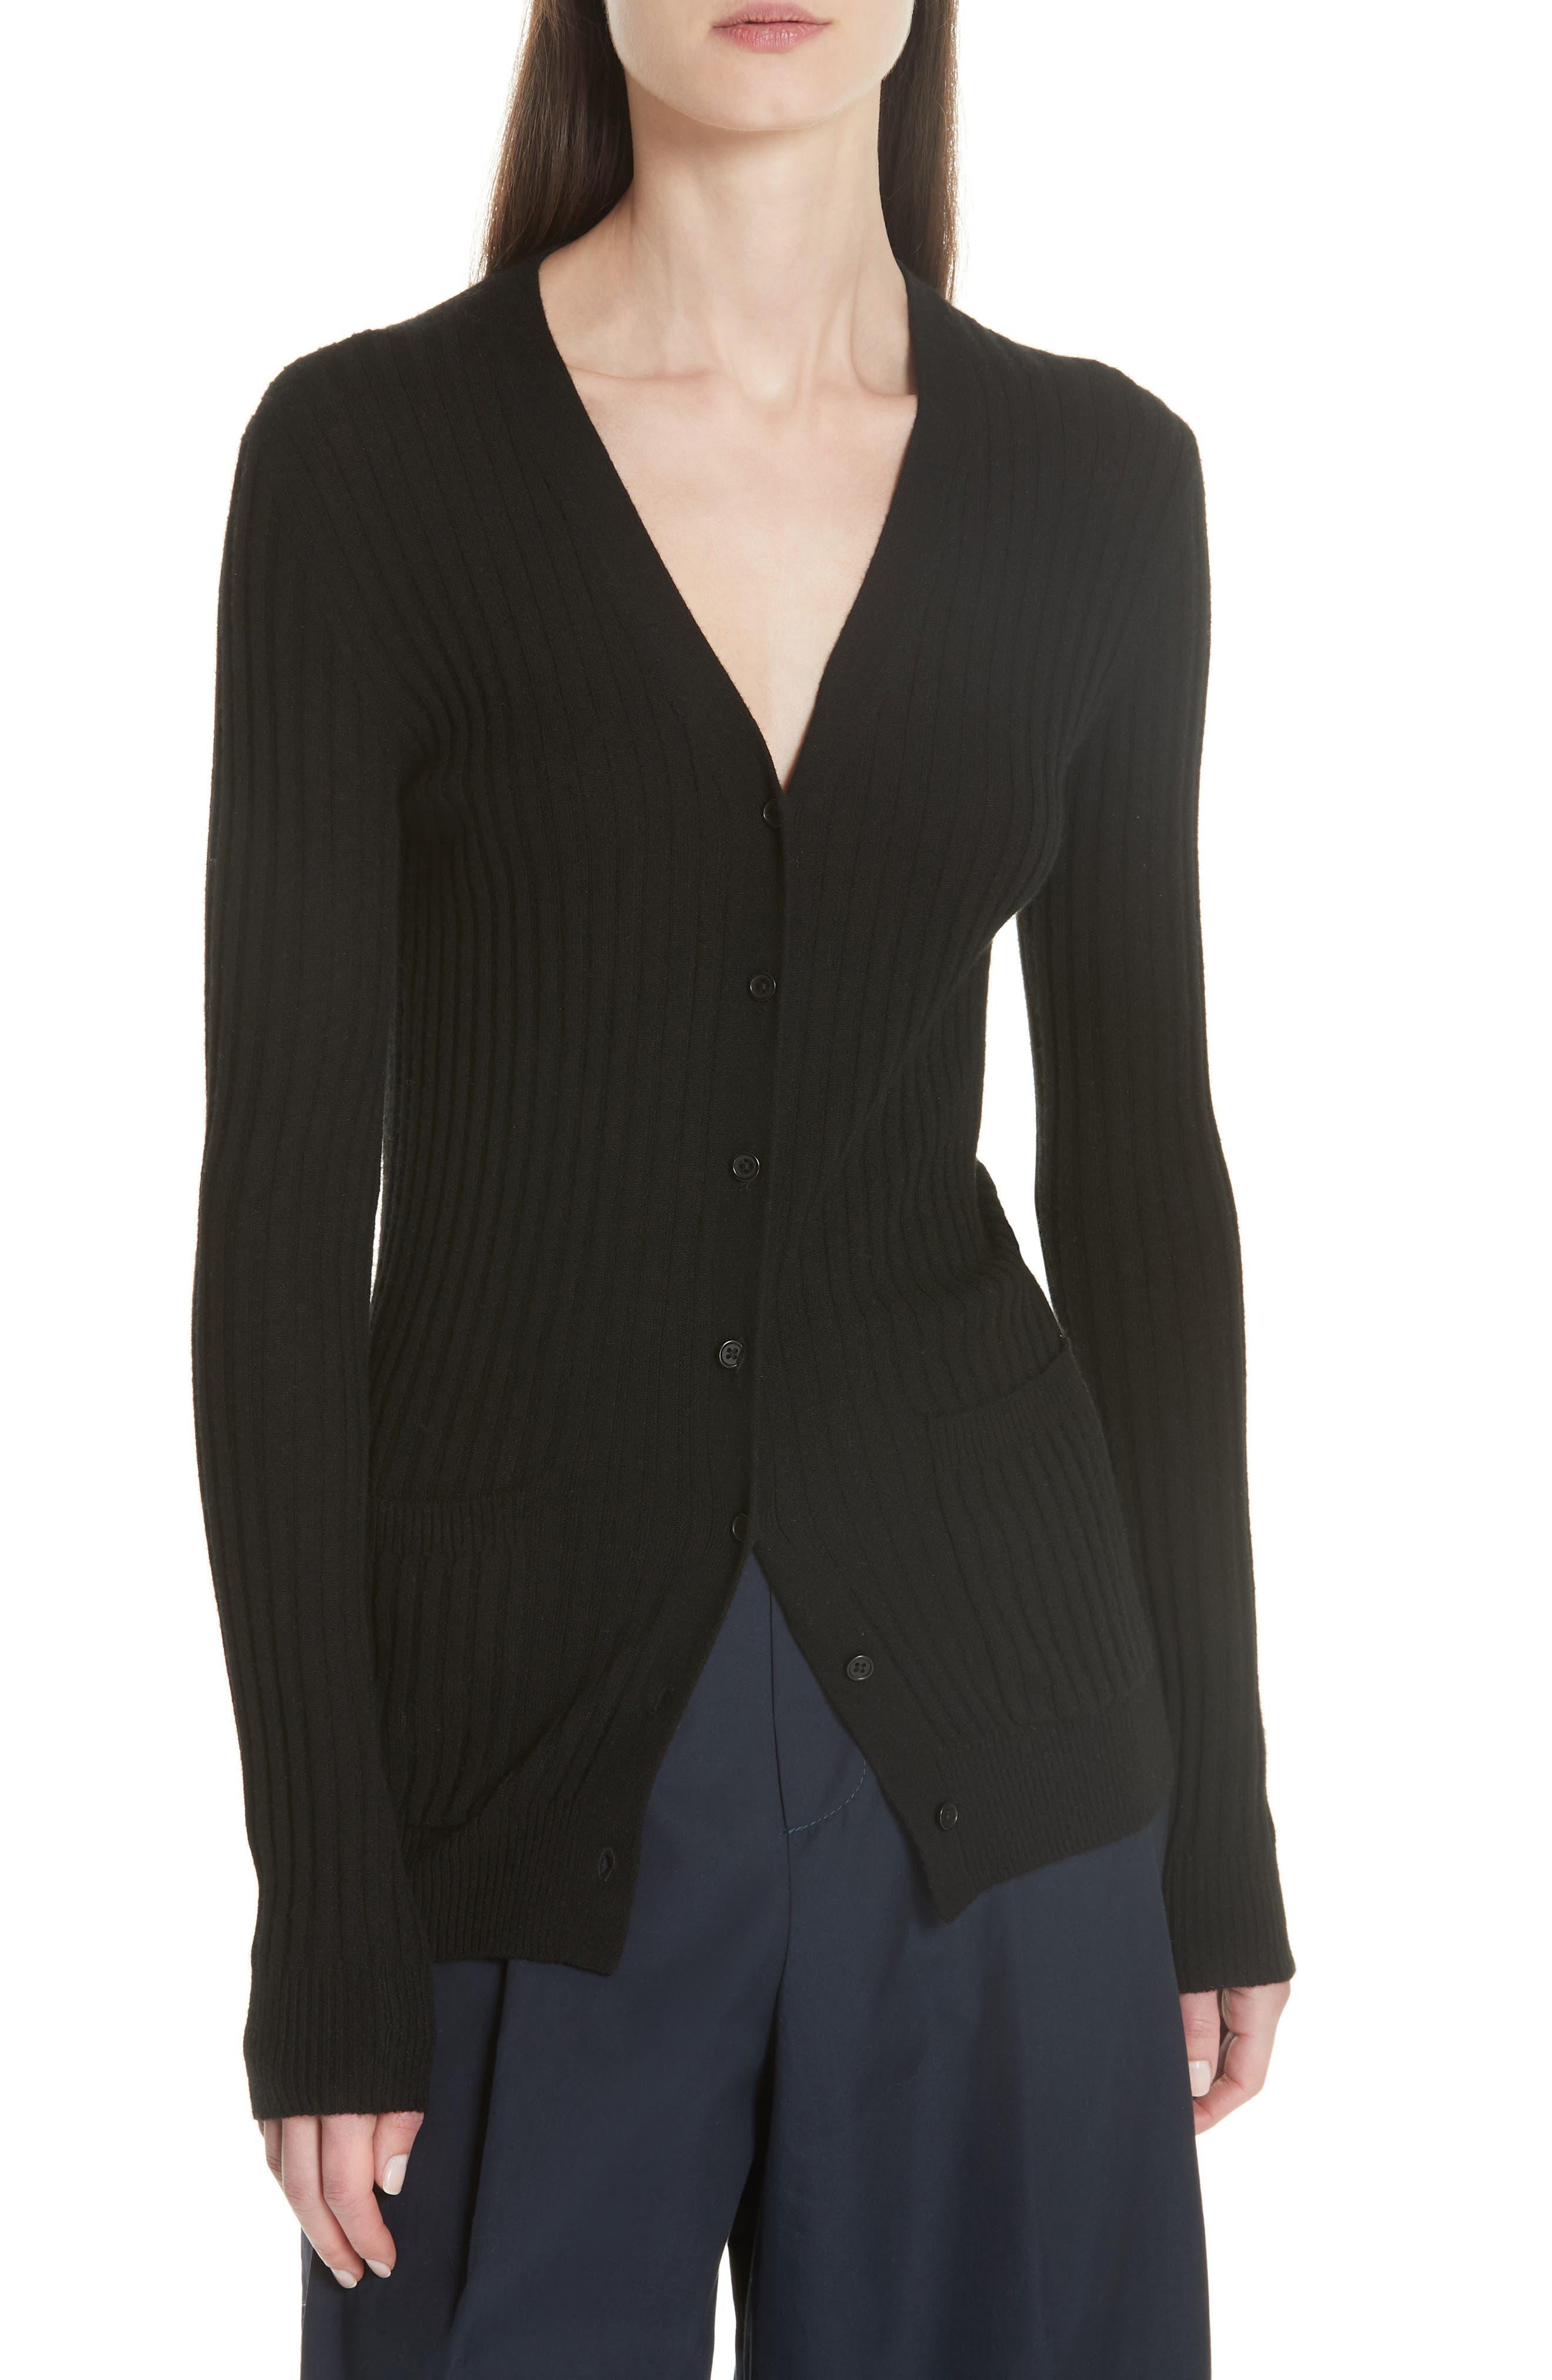 Ribbed Skinny Cashmere Cardigan,                             Main thumbnail 1, color,                             BLACK